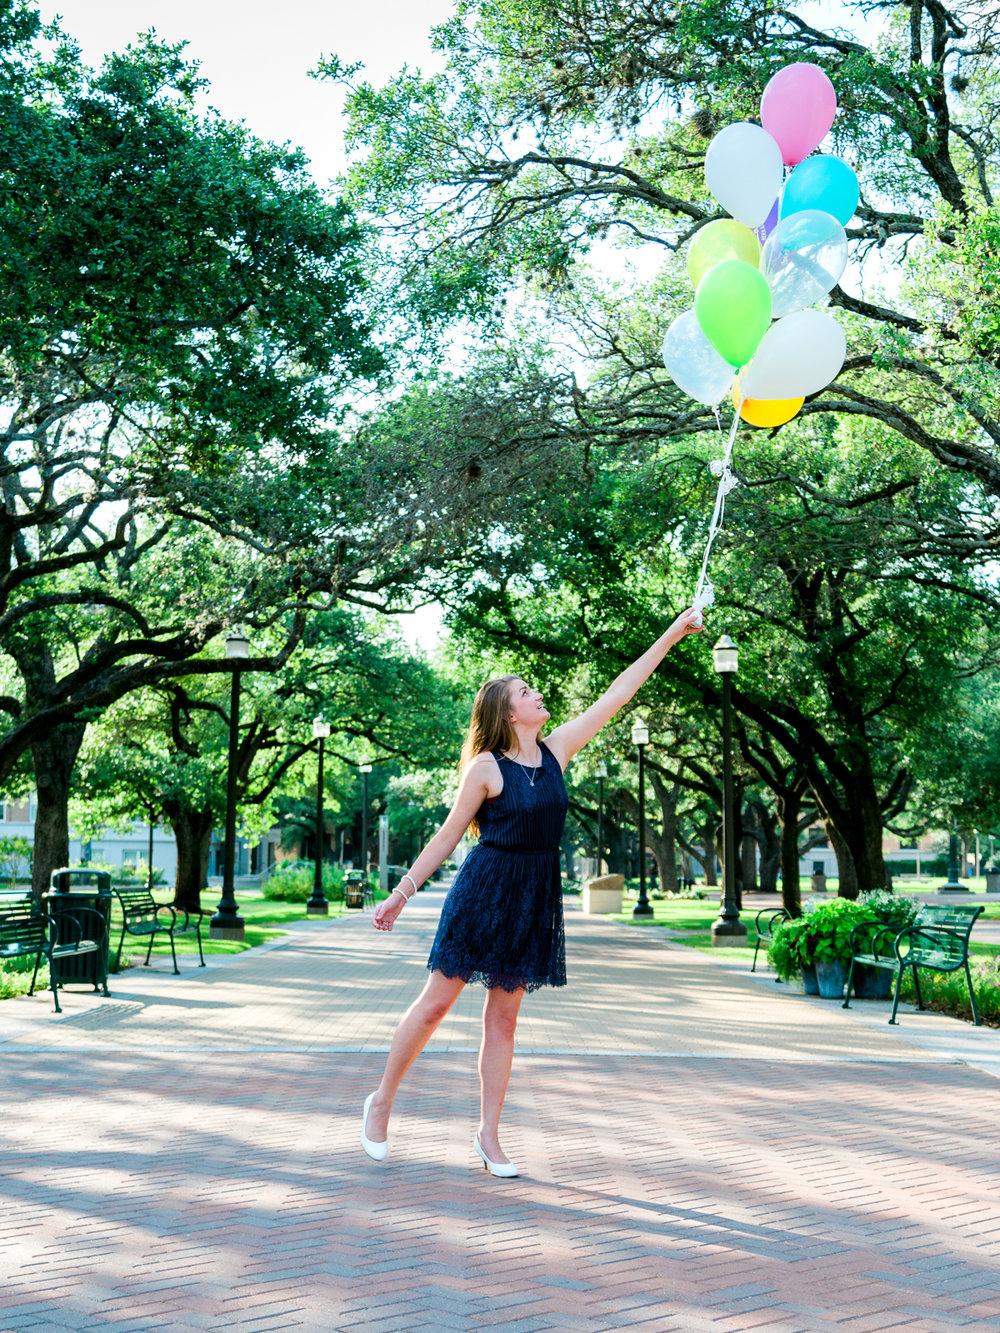 Balloons Take This Senior Away